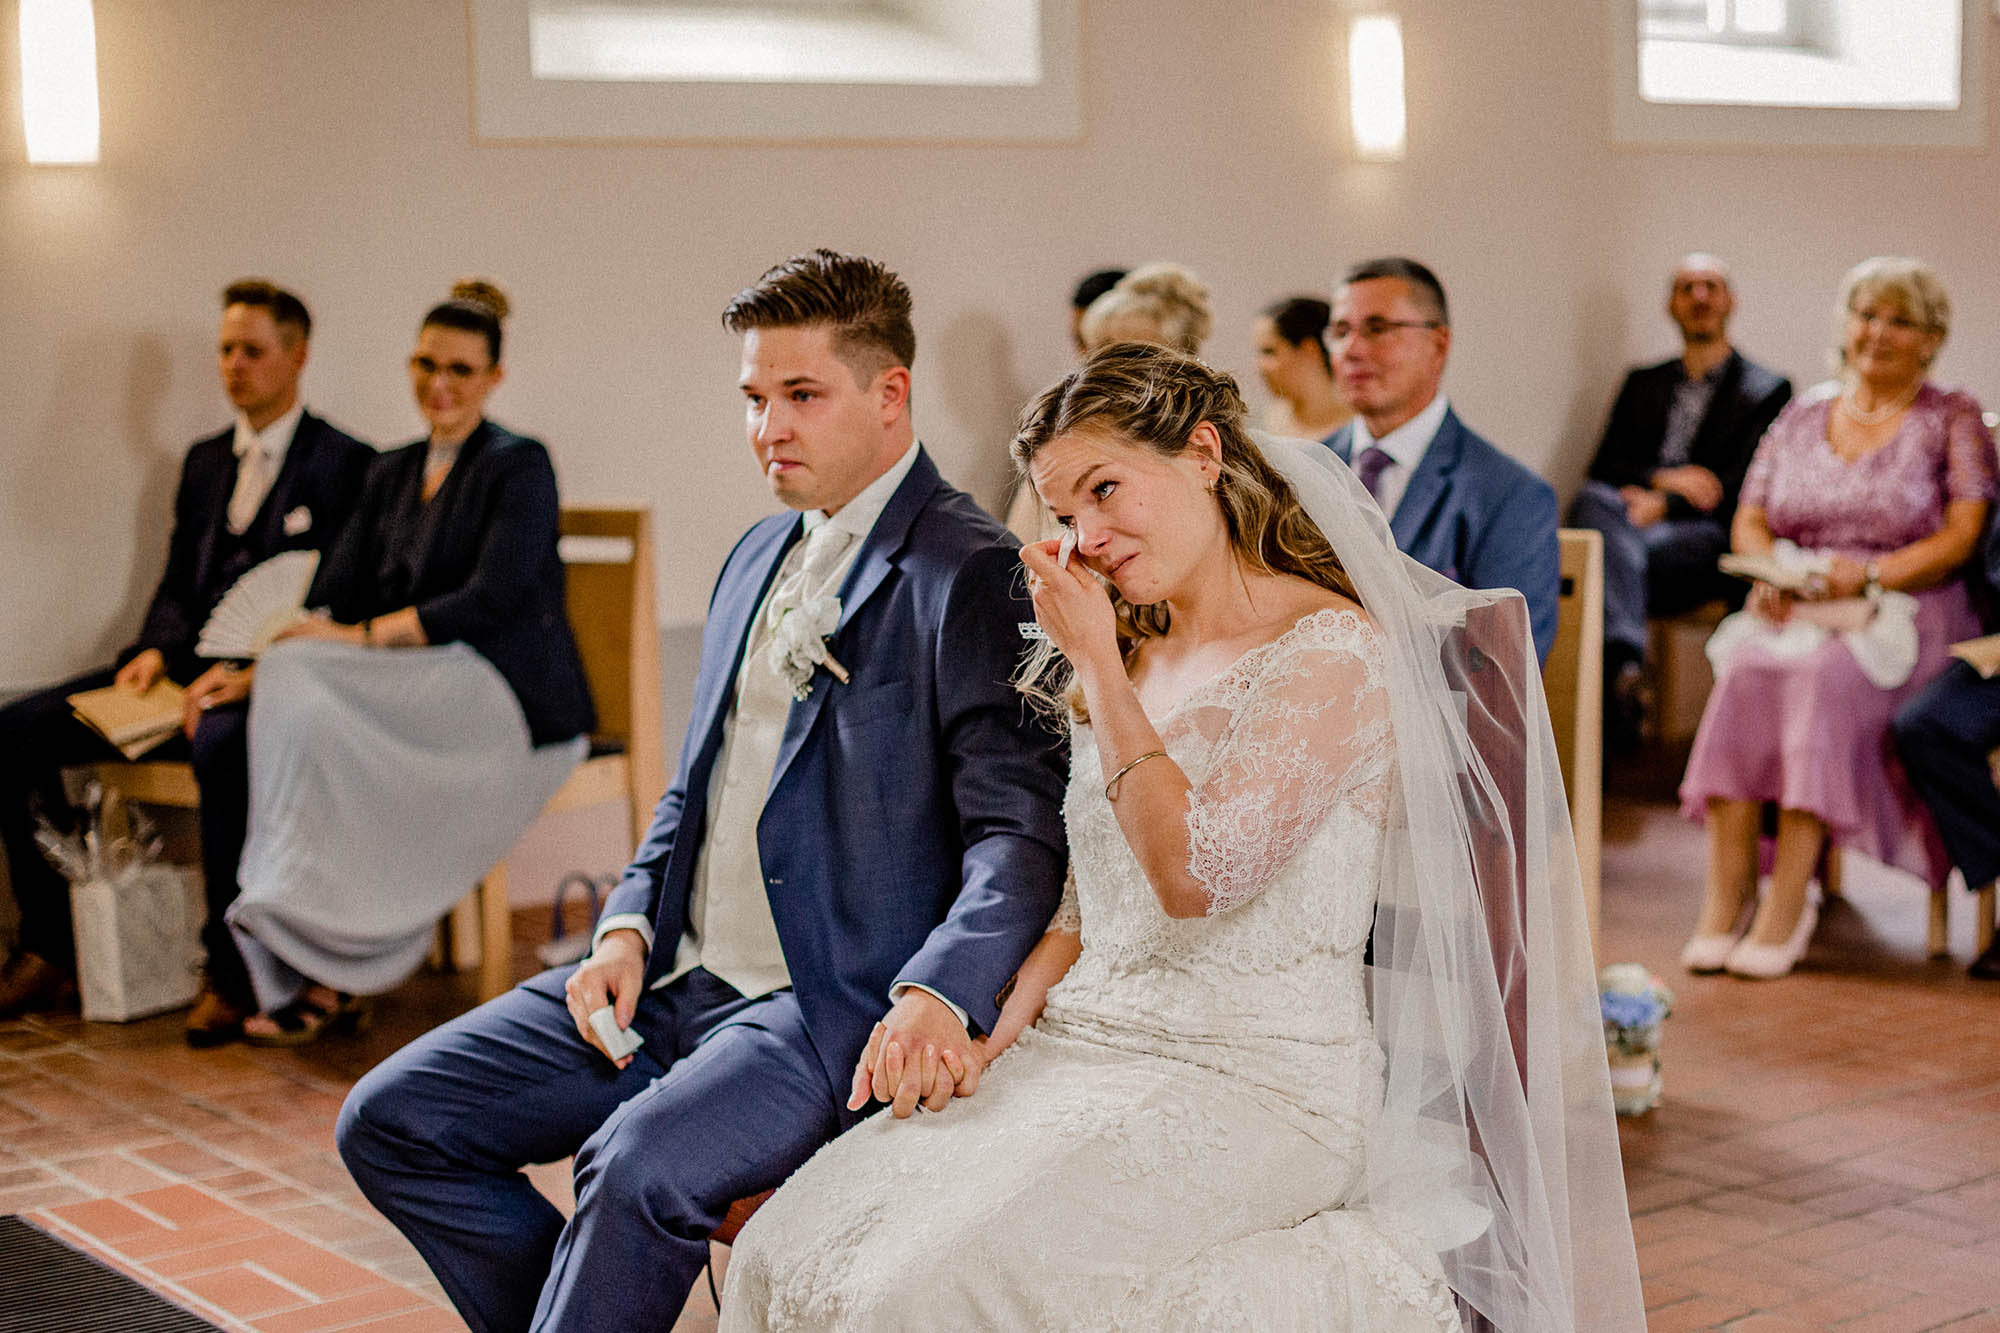 Virginia-Pech-Fotografie-Hochzeitsfotograf-Hochzeitsfotografie-Kulturscheune-Rangsdorf-Berlin-Anika-Nico-30